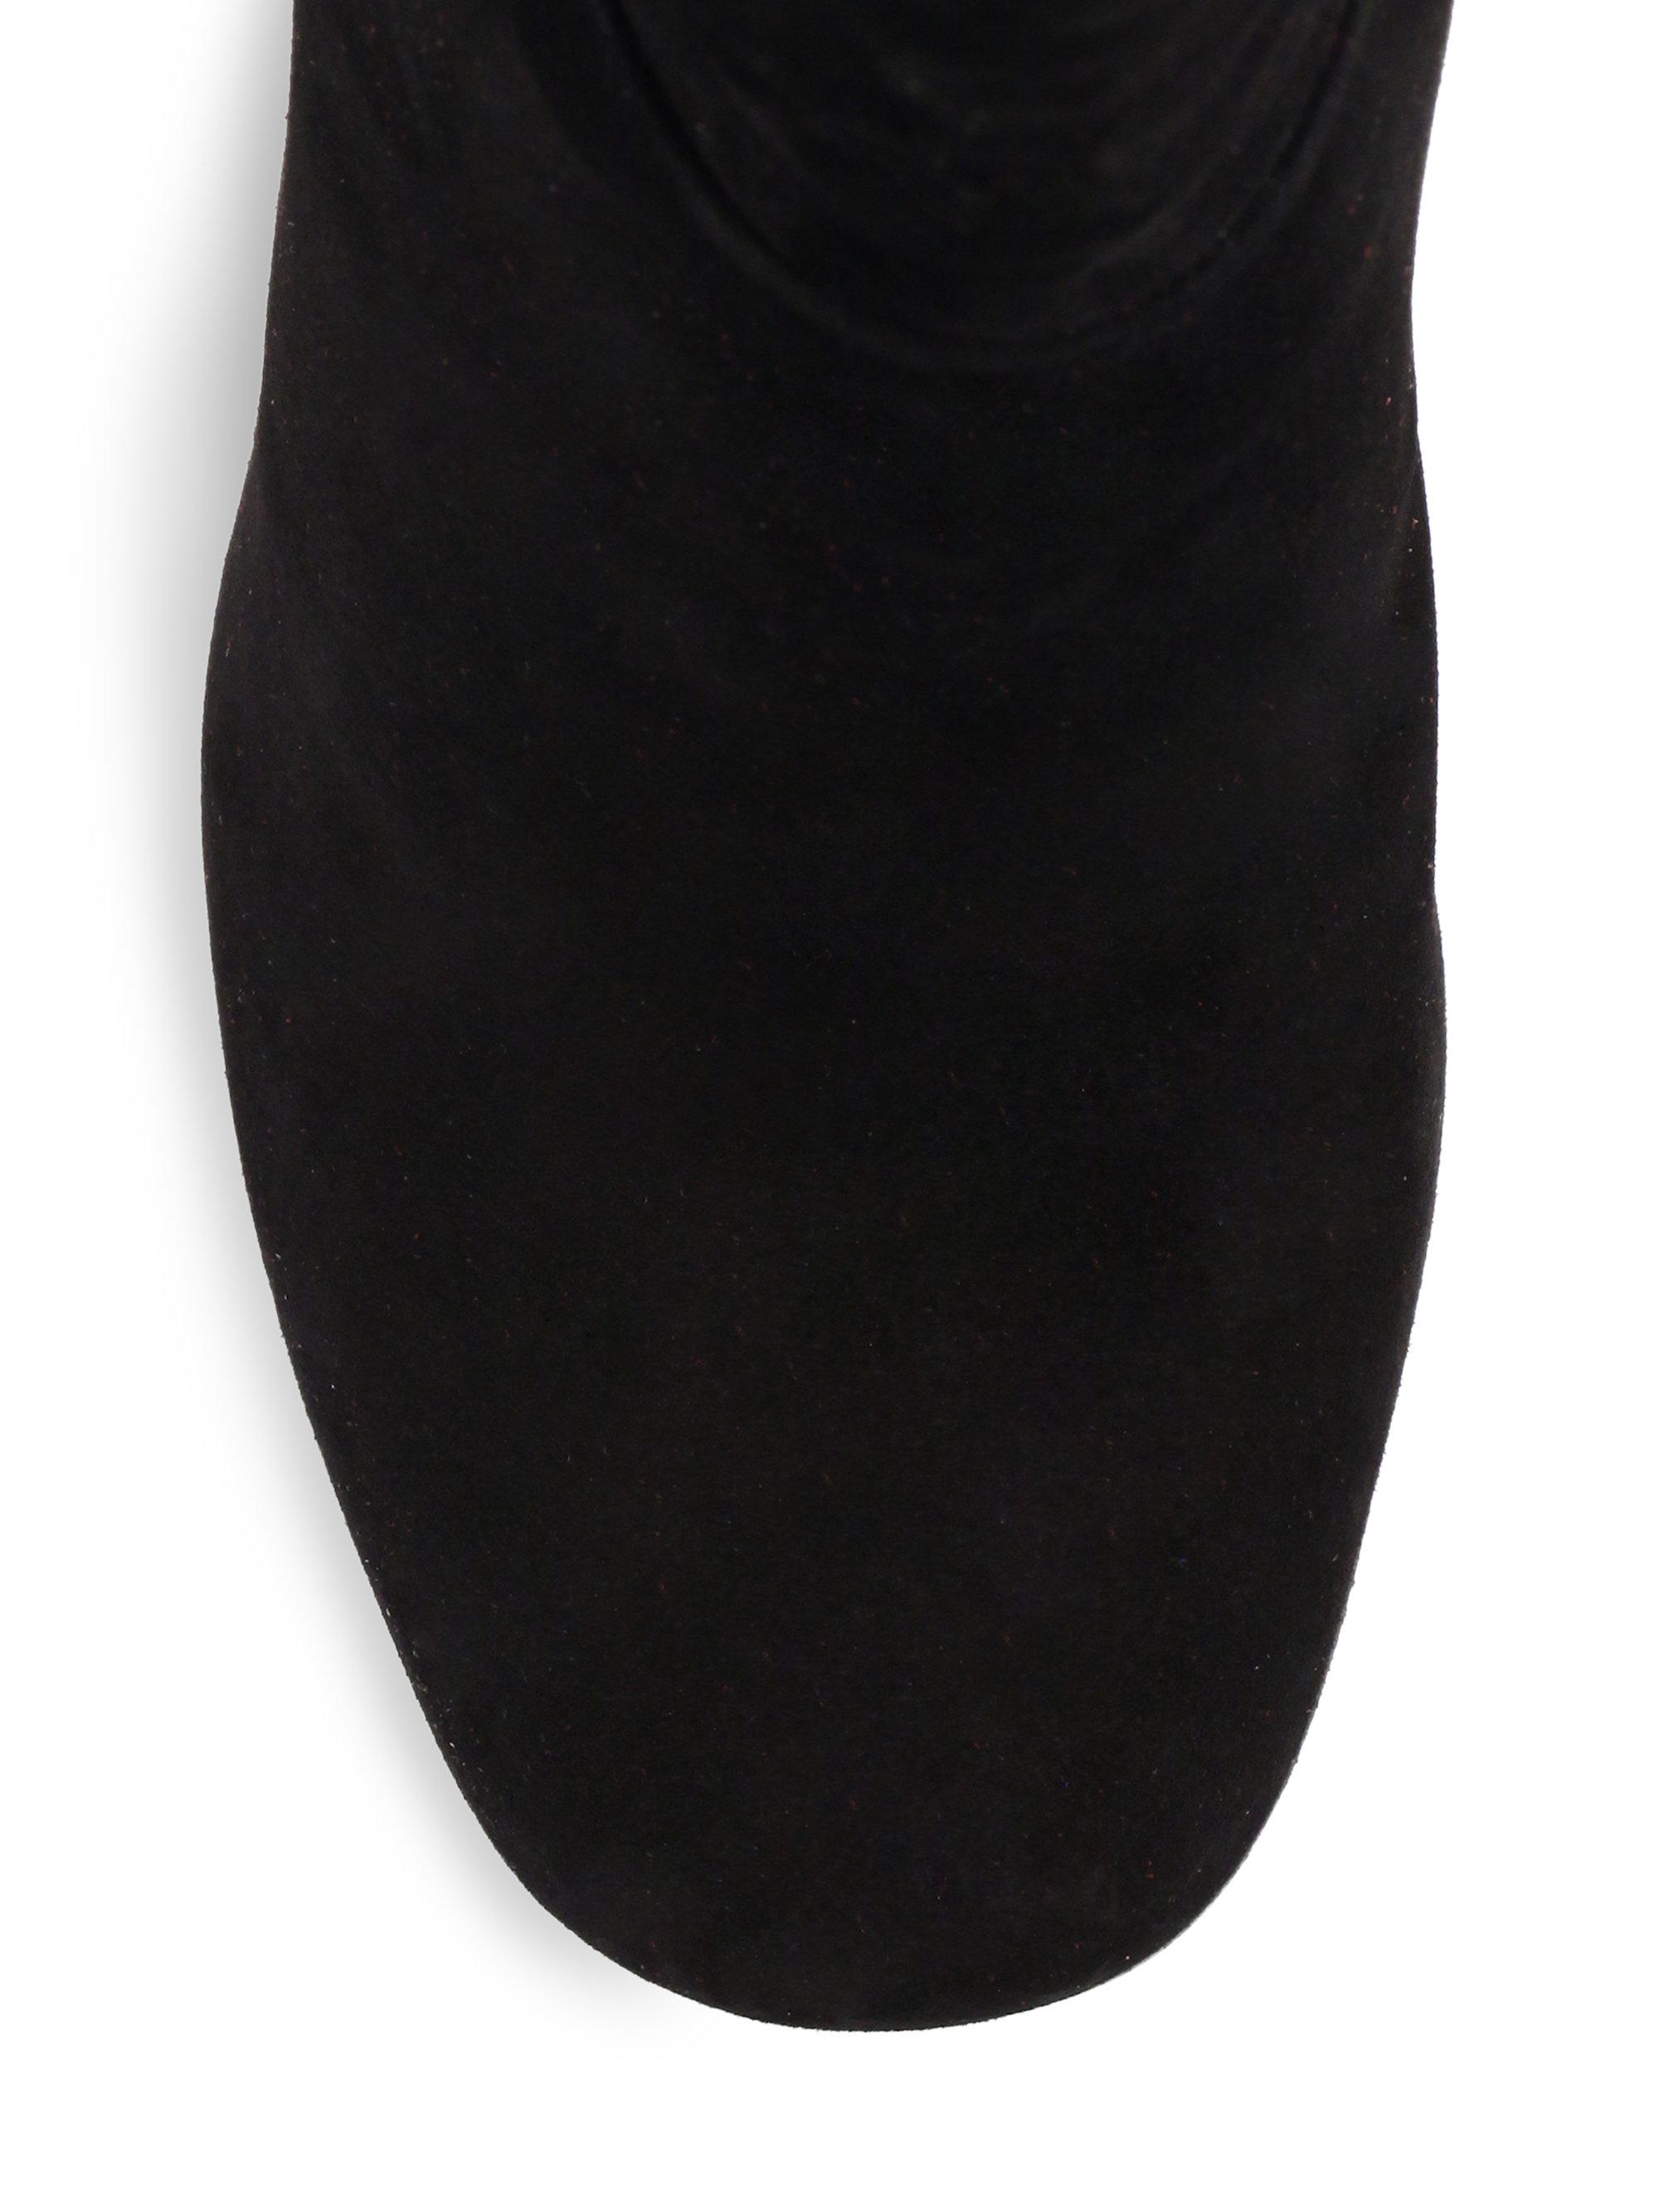 prada suede the knee boots in black lyst